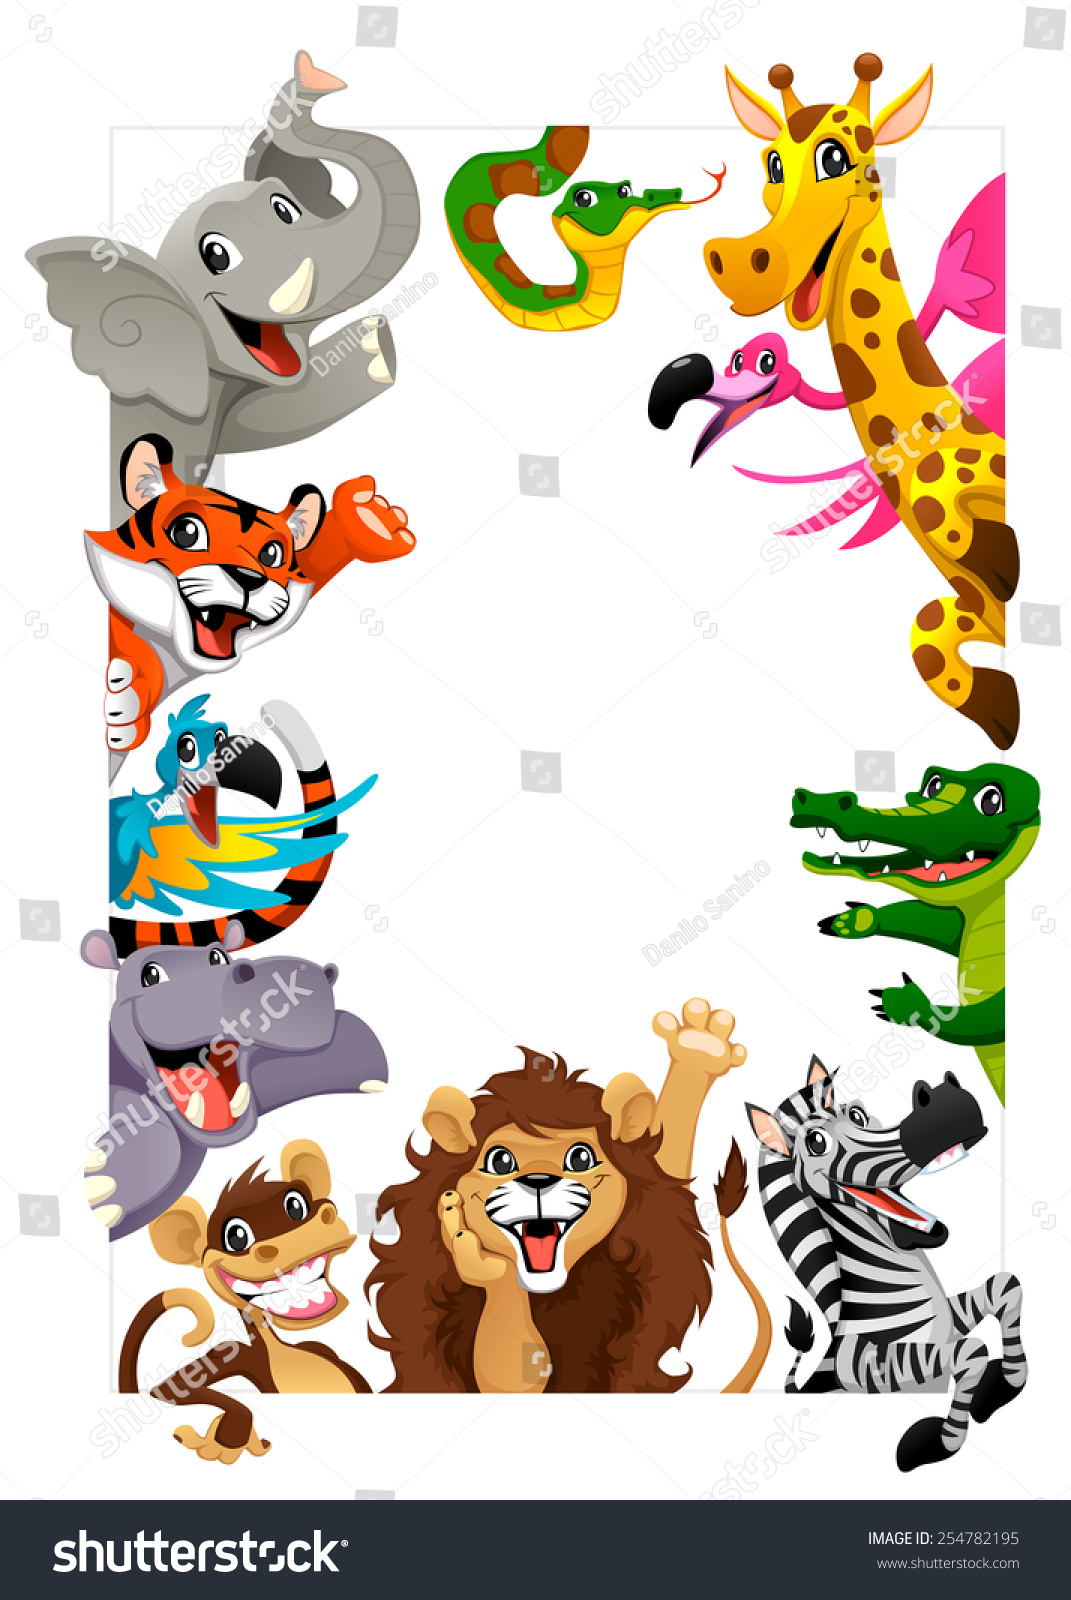 Funny Group Jungle Animals Cartoon Vector Stock Vector ...